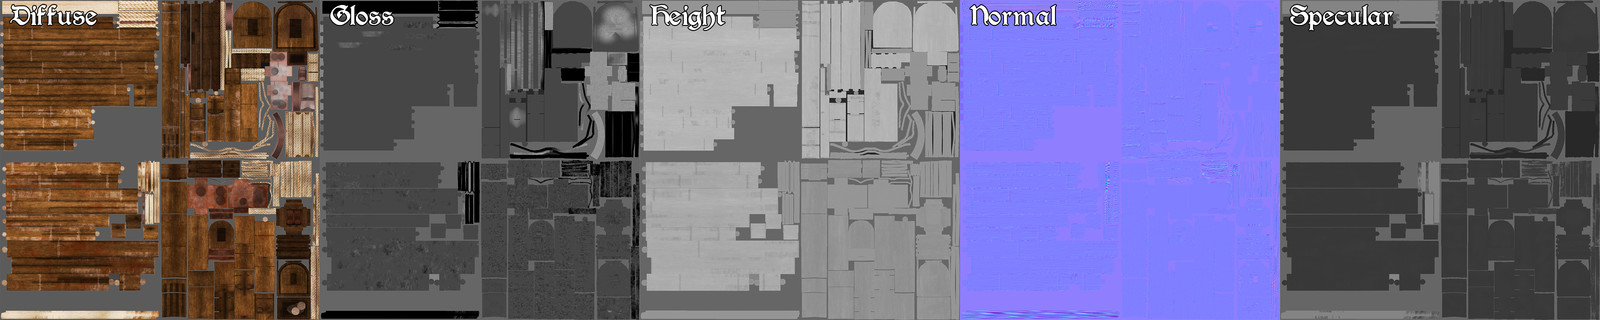 Foremast Crossbeams, Foremast, Mainmast Crossbeams and Mainmast Textures